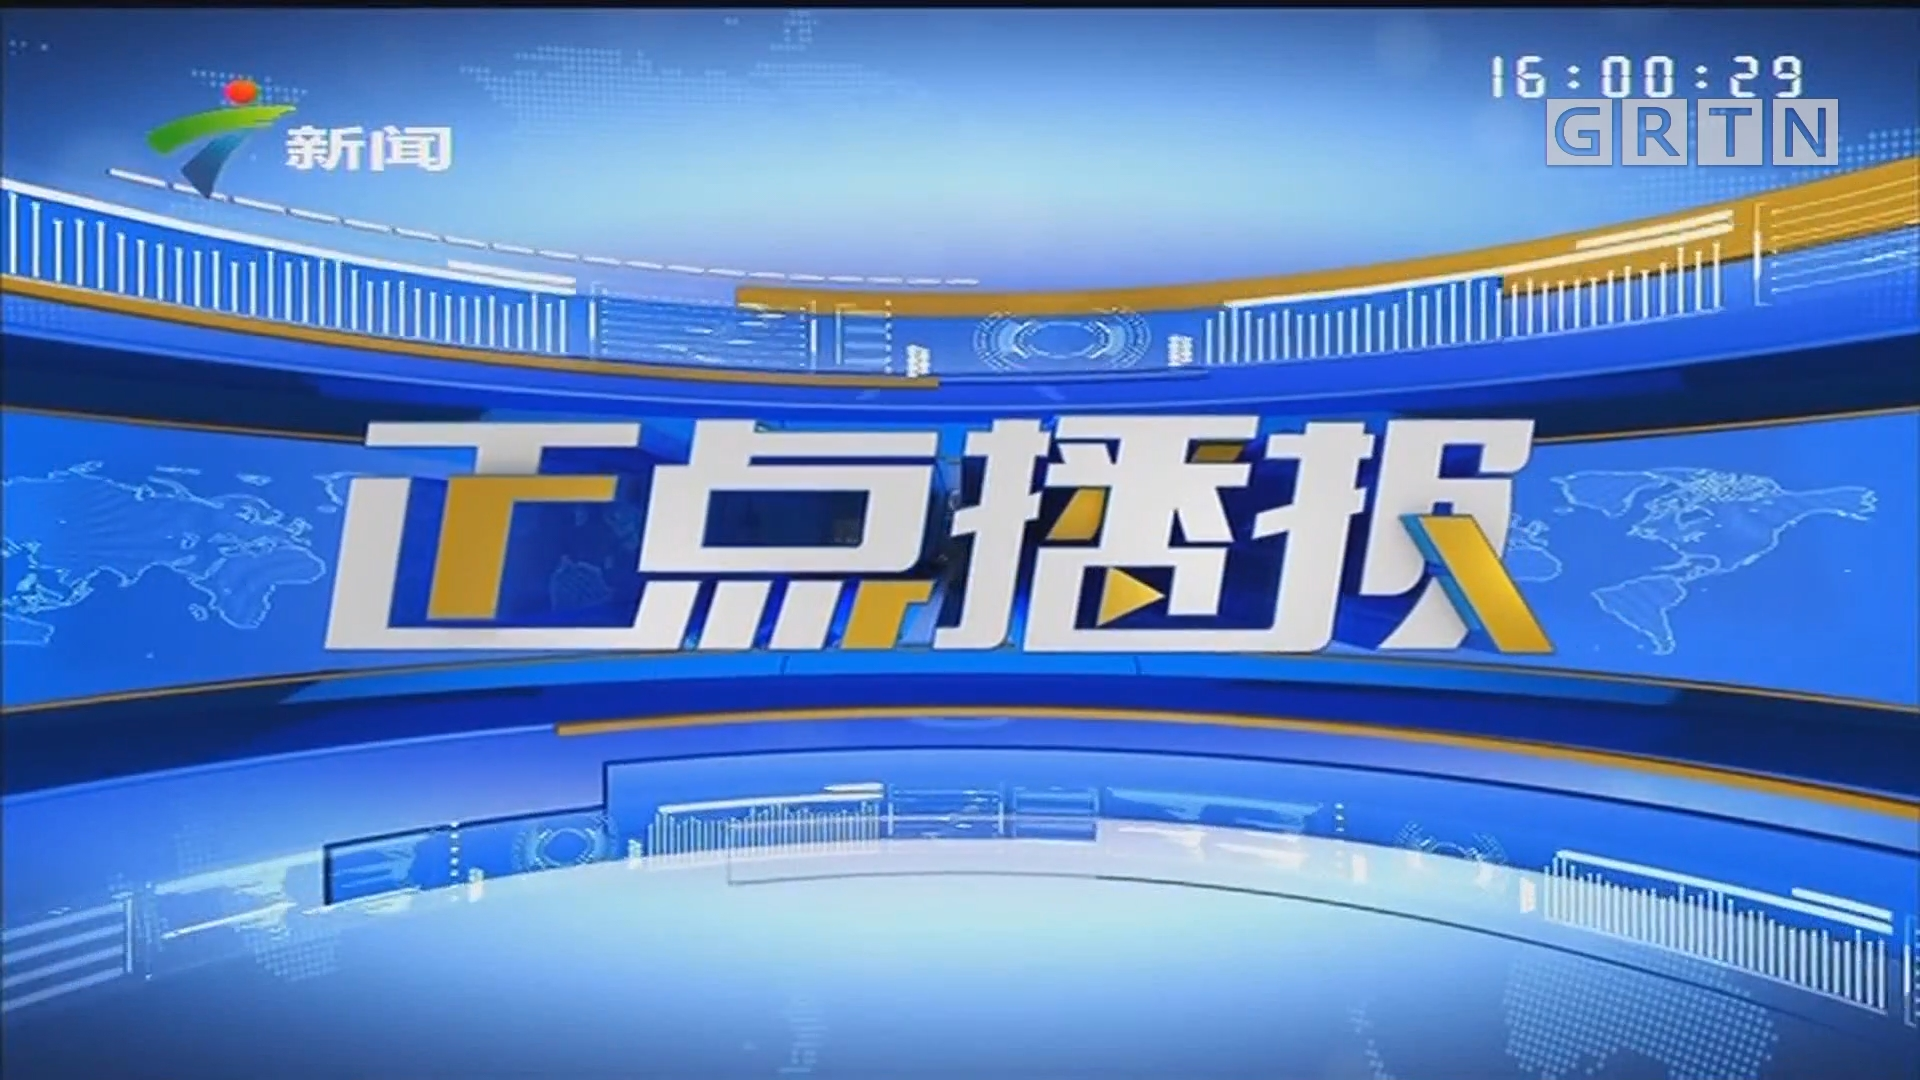 [HD][2019-09-15]正點播報:中秋假期返程·公路:今天下午擁擠程度為平日2.1倍